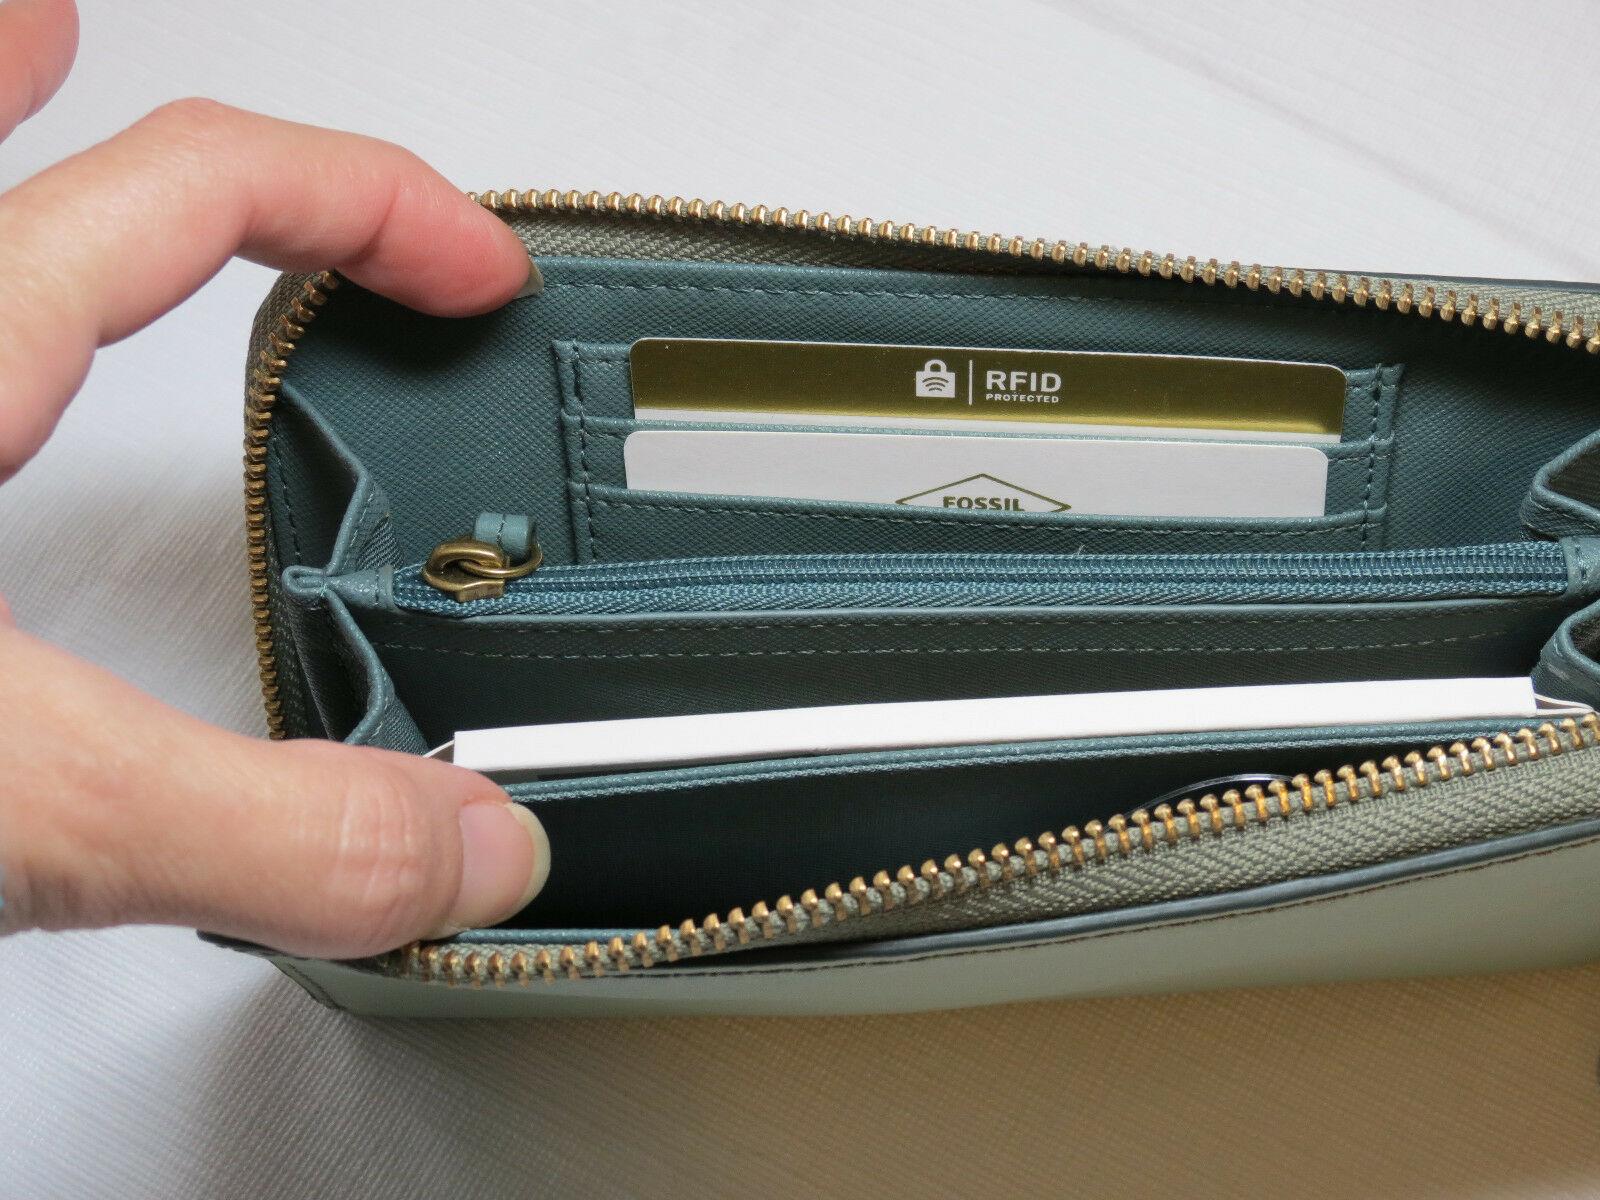 Fossil SL7151336 RFID Emma Smartphone Wristlet Lght Sage wallet clutch leather*^ image 5